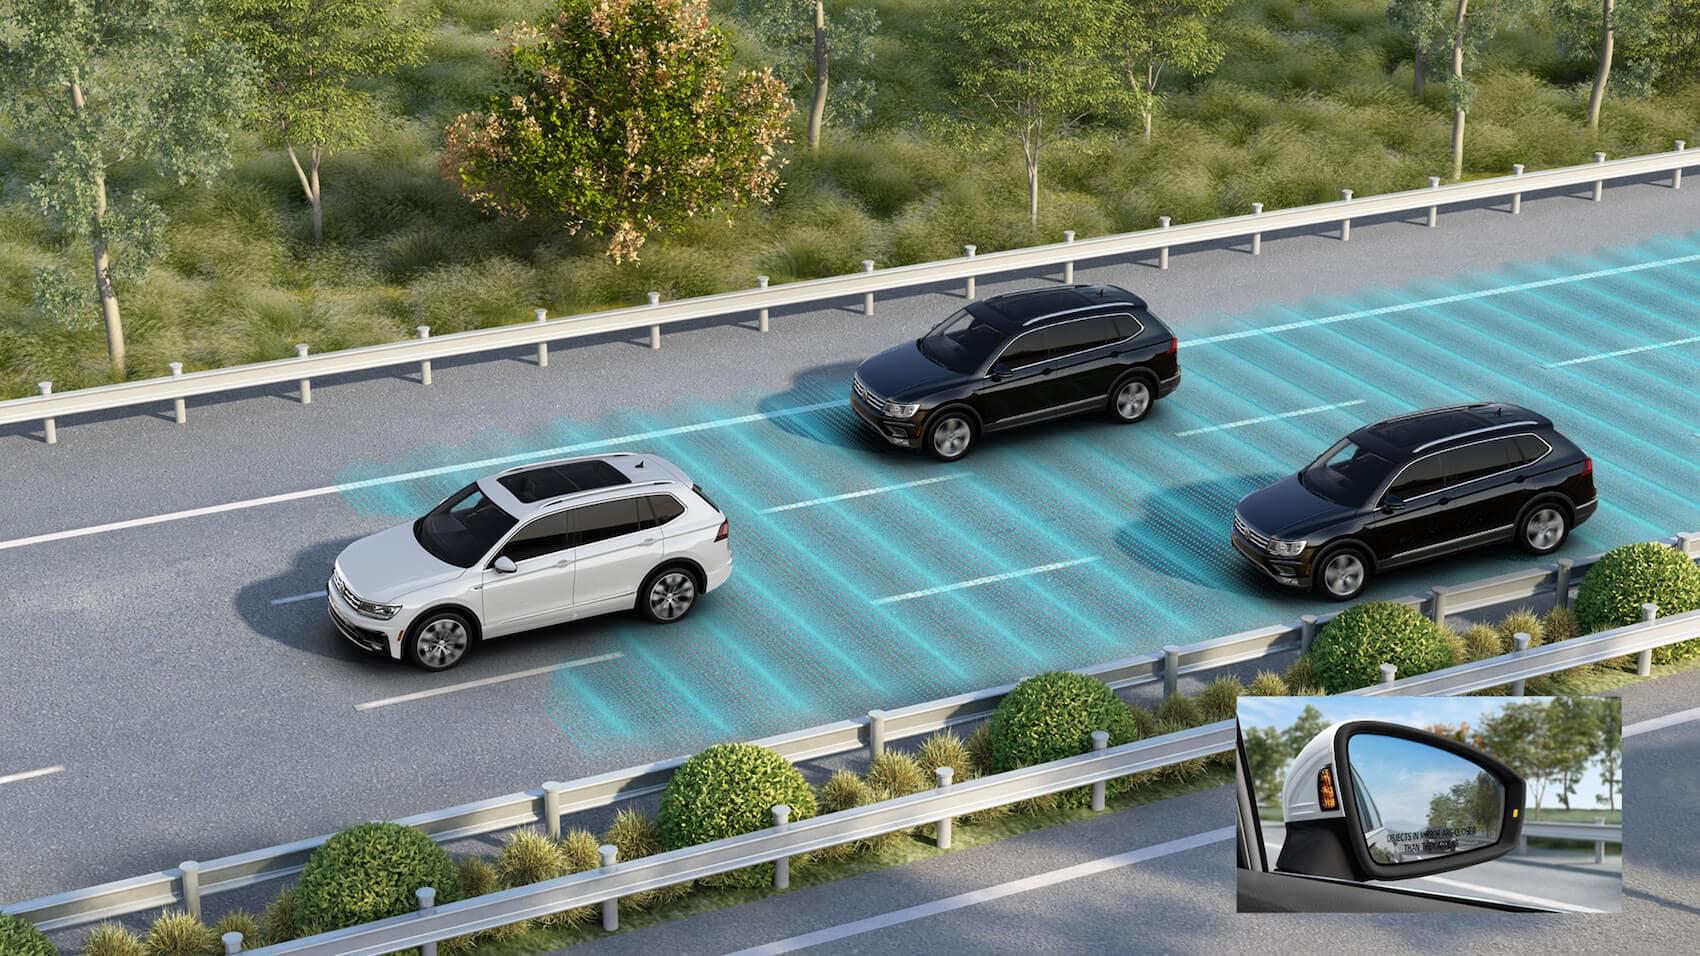 2020 Volkswagen Tiguan blind spot monitor Toms River, NJ